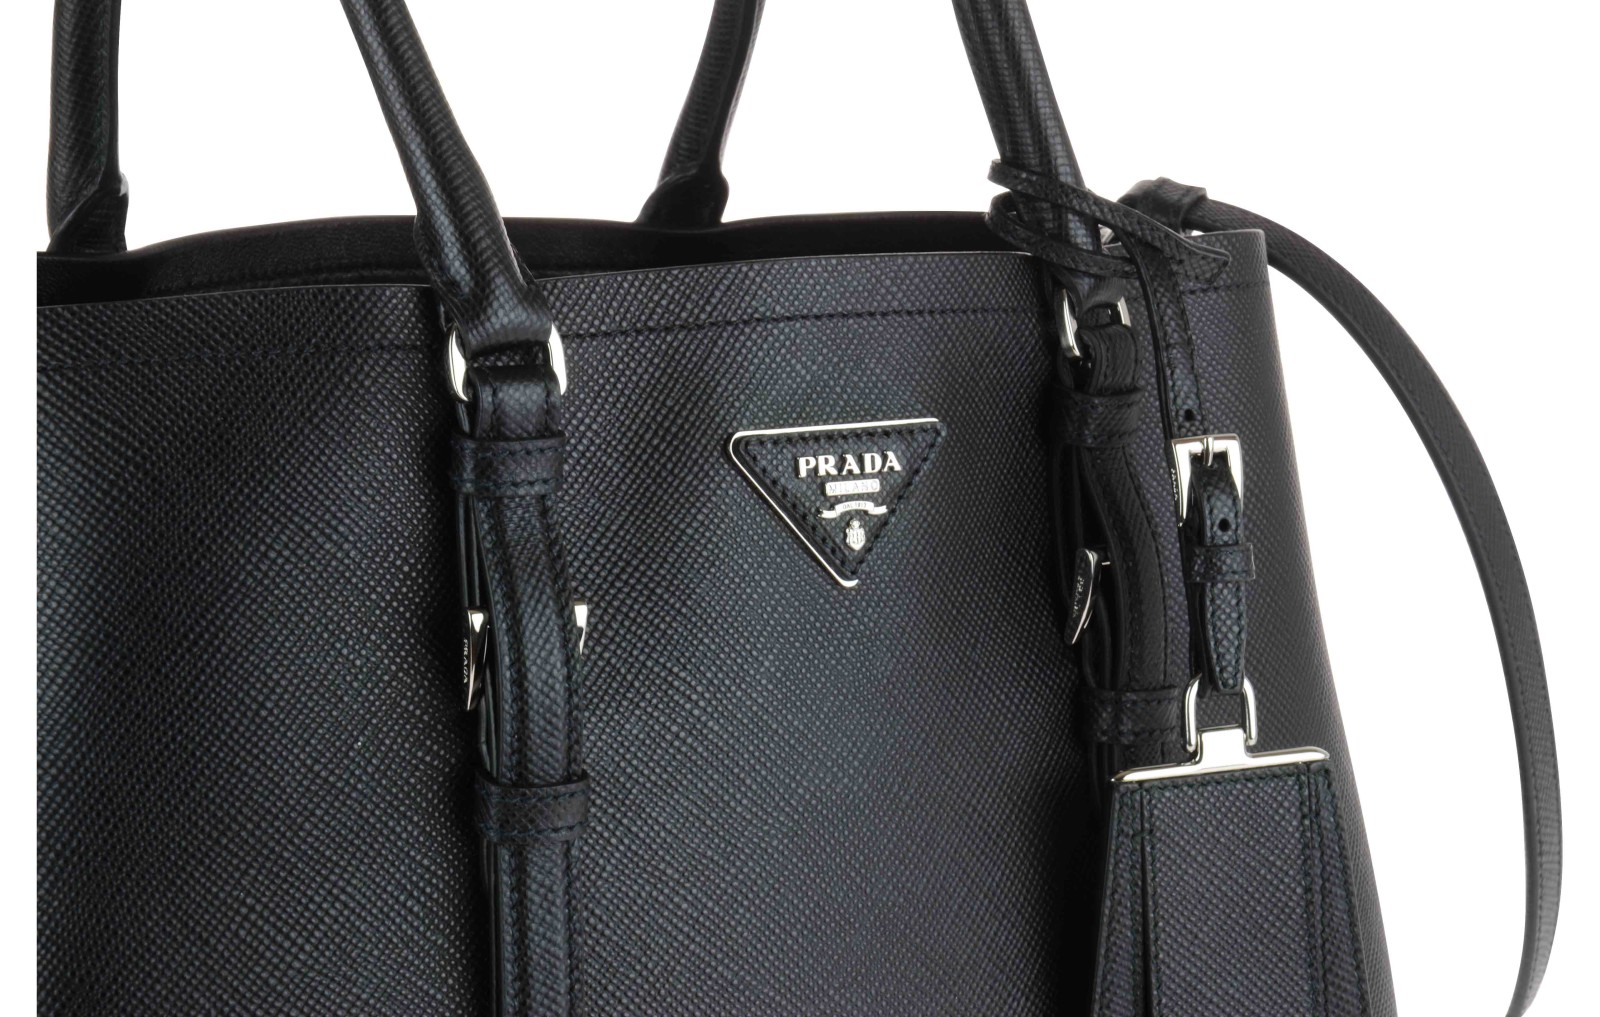 prada--borsa-shopping-in-pelle-saffiano-manici-e-tracolla-product-1-27236847-4-209516040-normal.jpeg